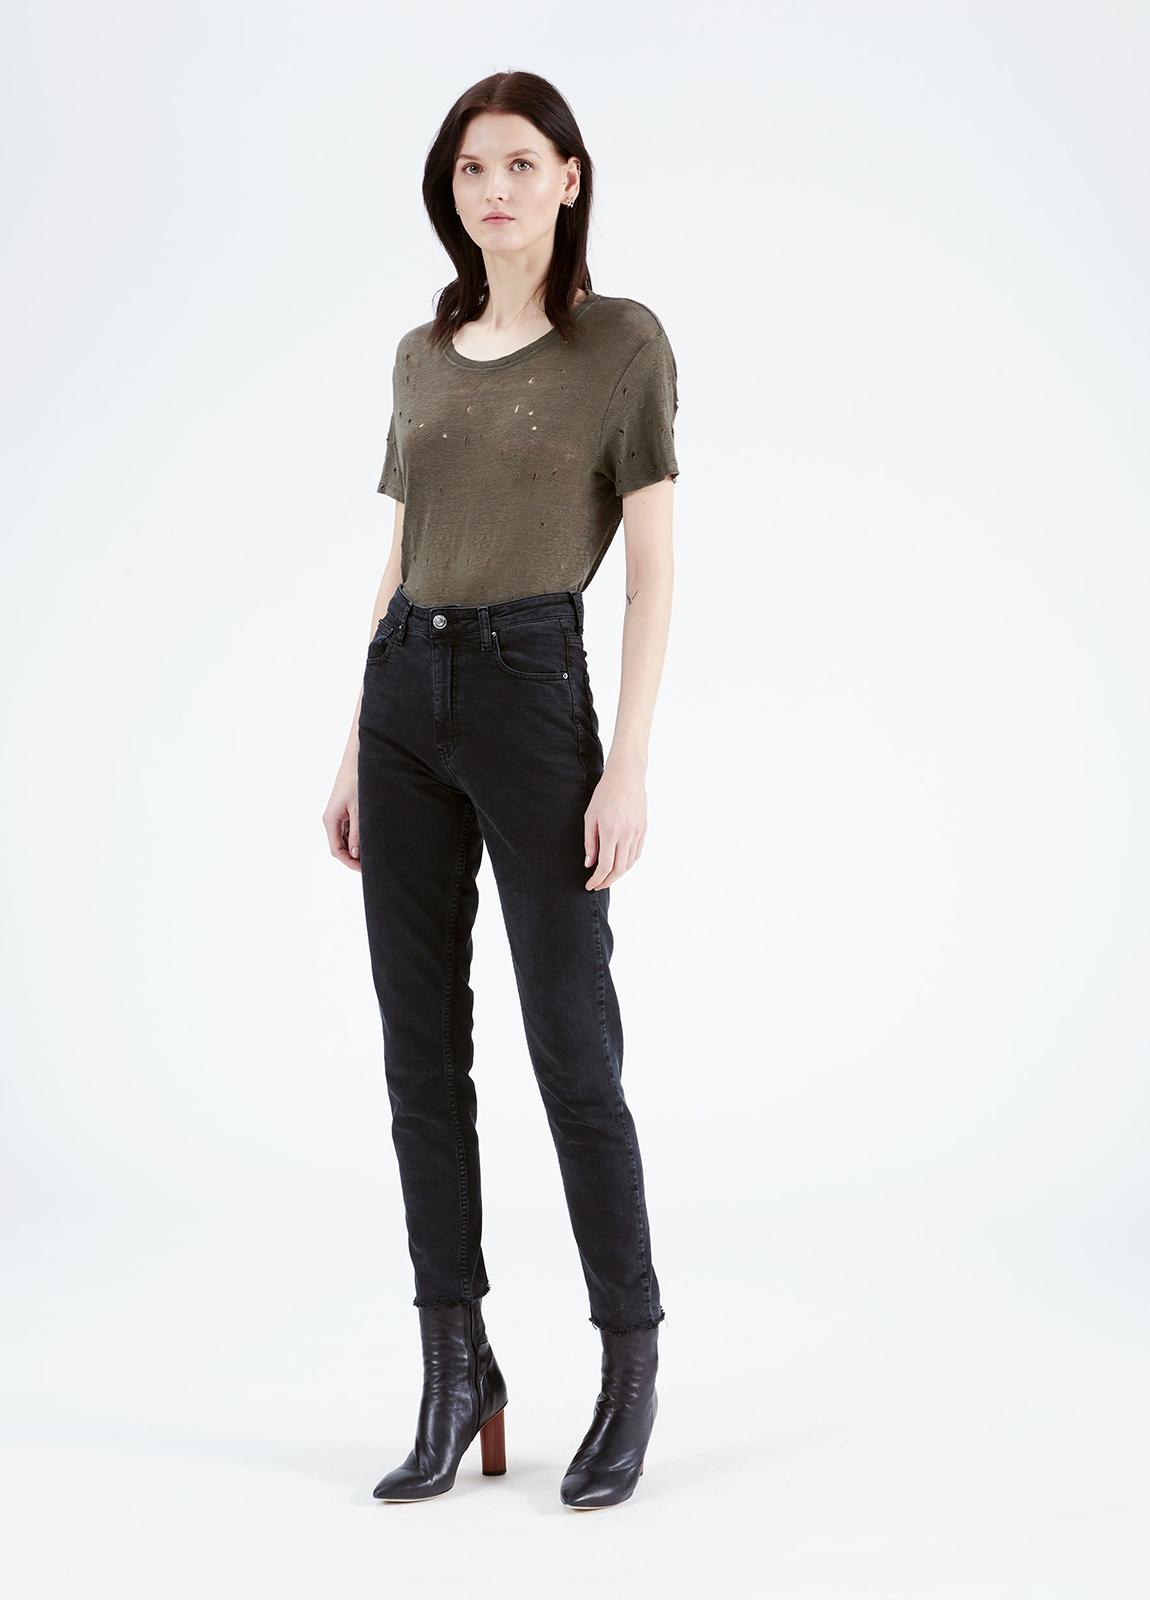 Camiseta woman color kaki con detalles calados. 100% Lino. - Ítem3